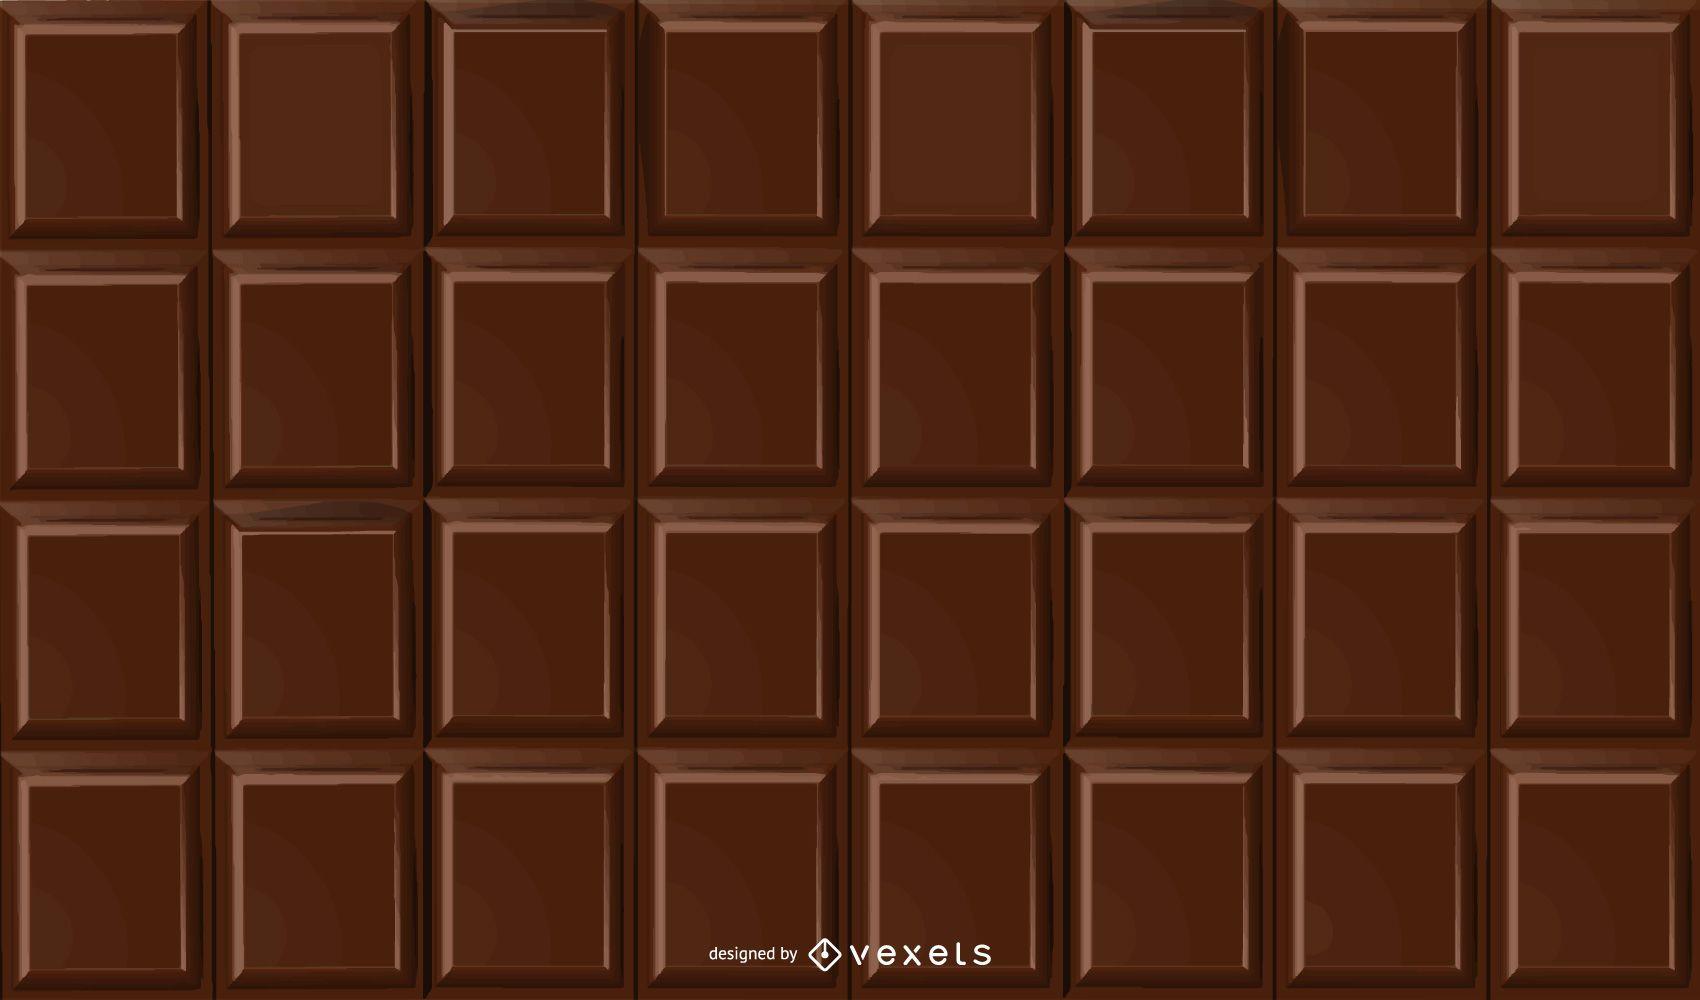 Fragrant Chocolate Bar Background